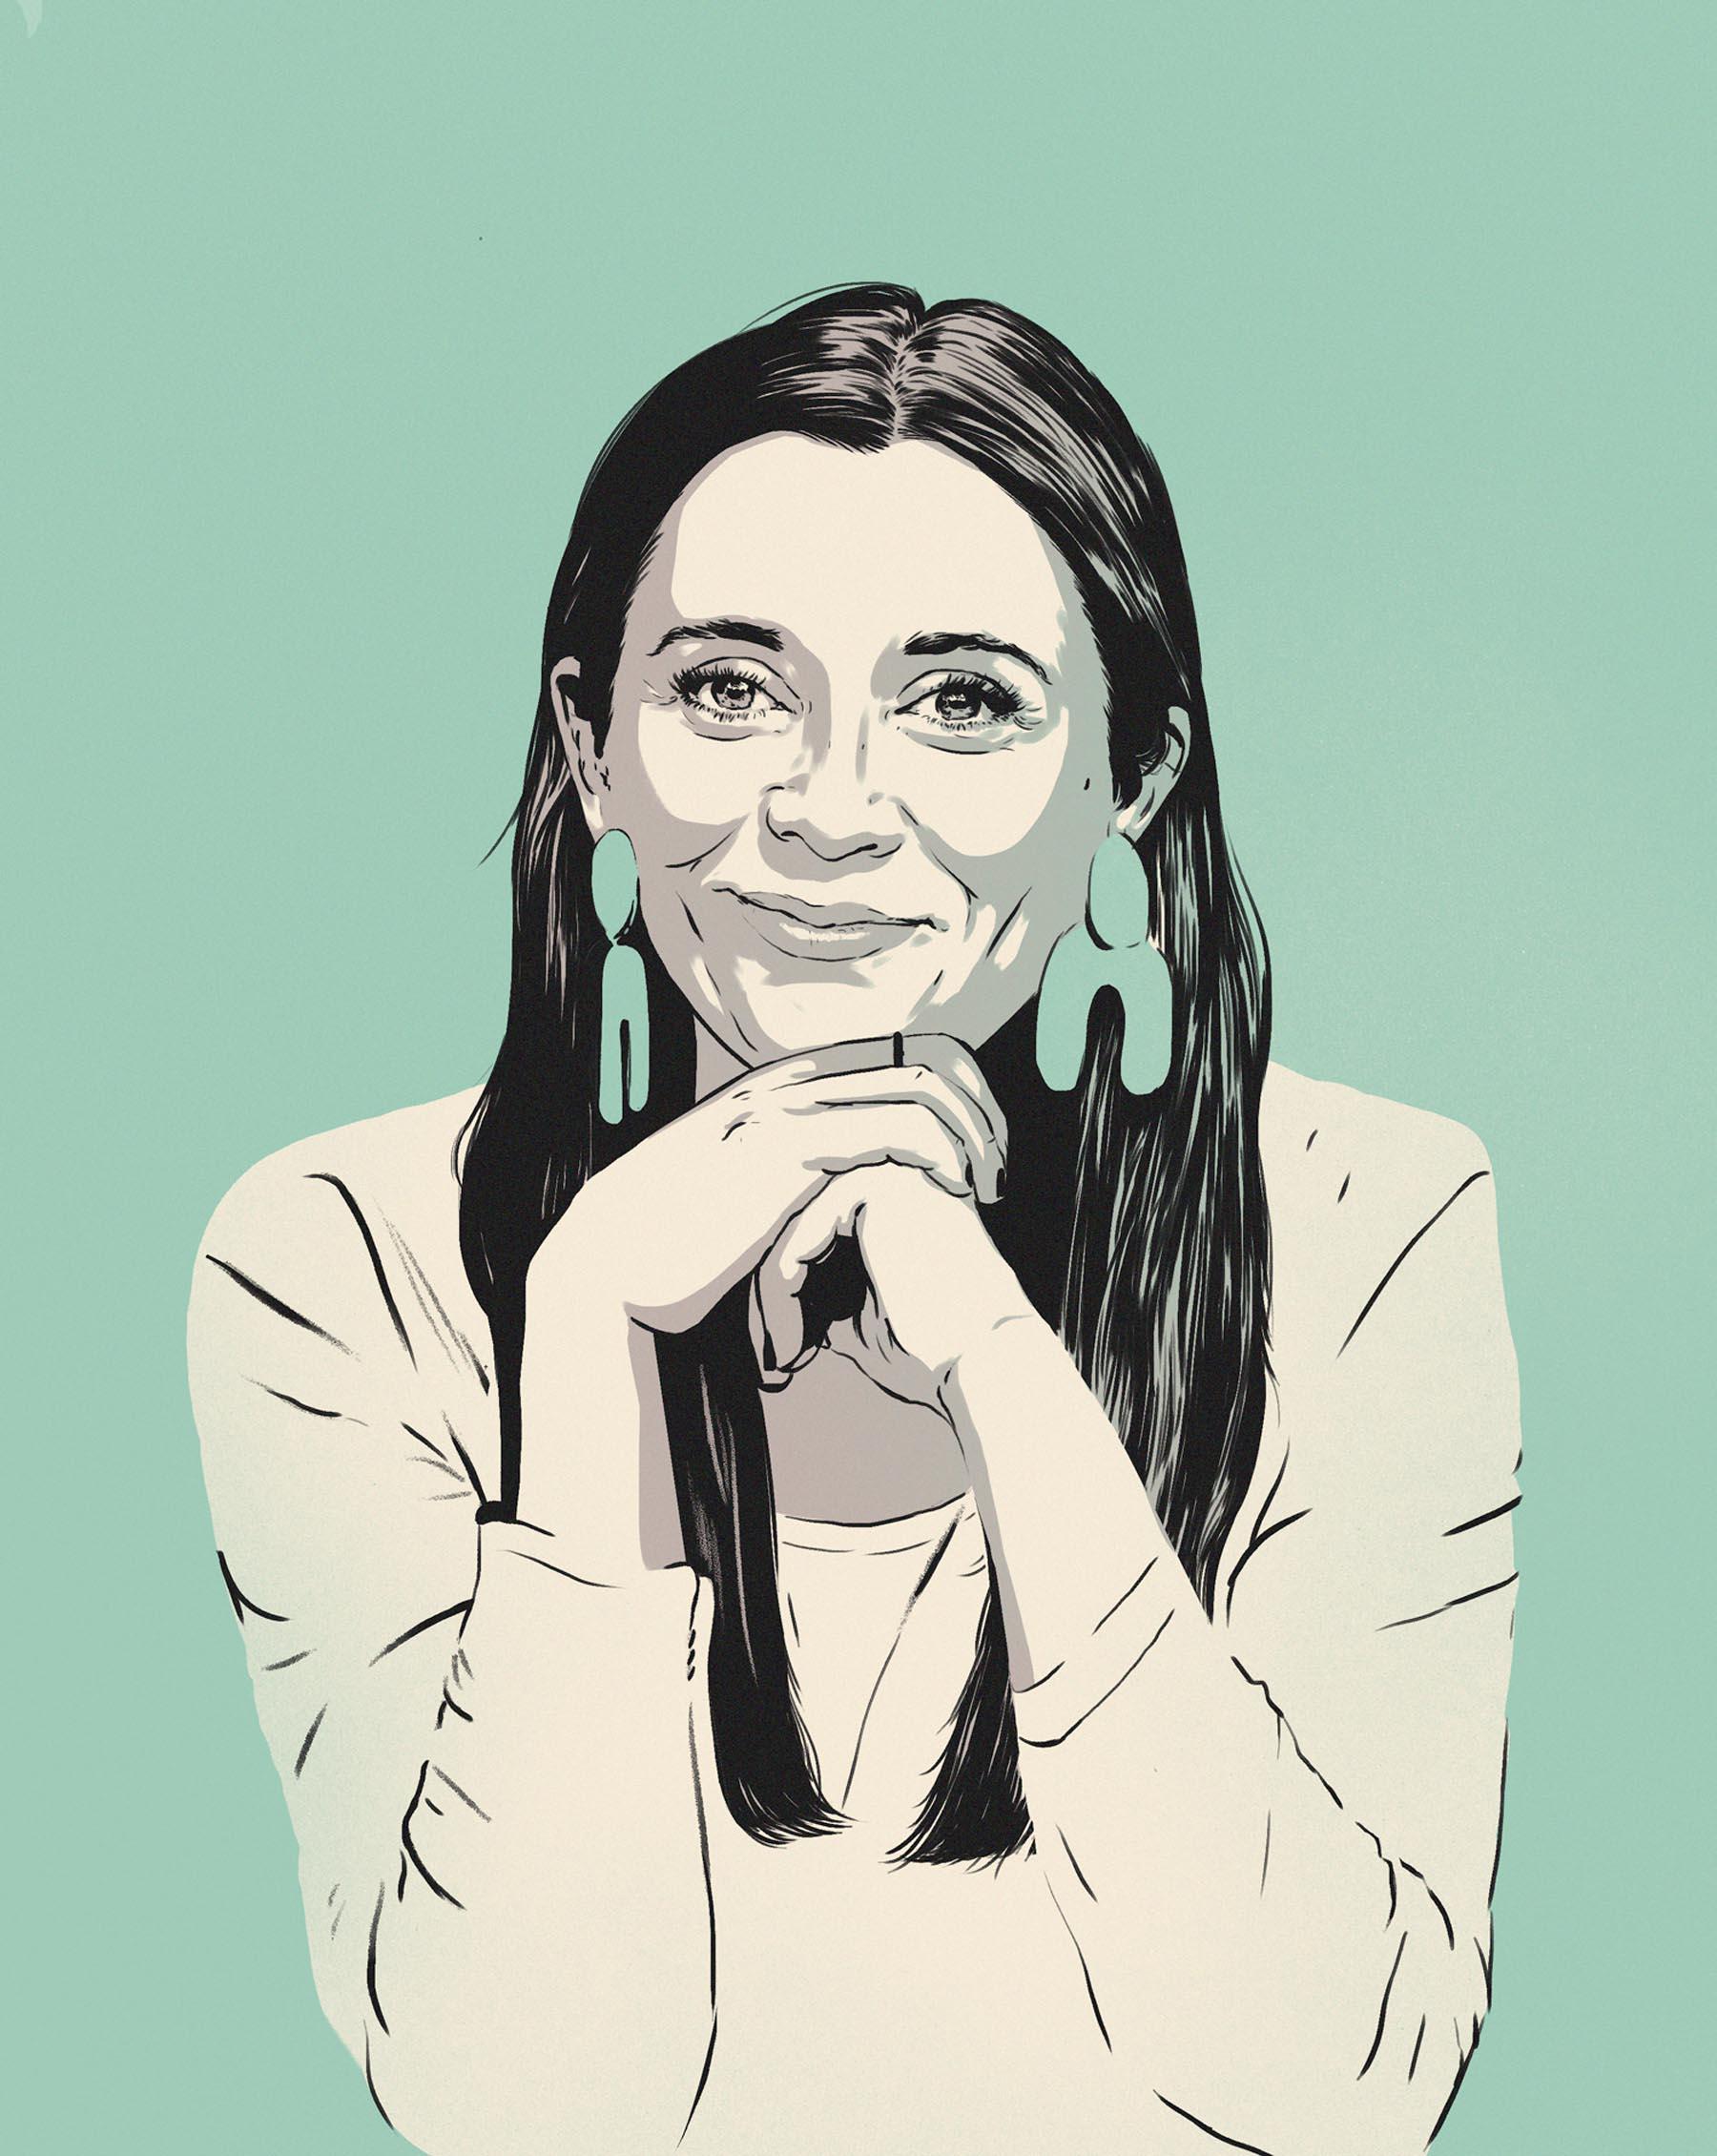 An illustrated portrait if Meghan Kraemer